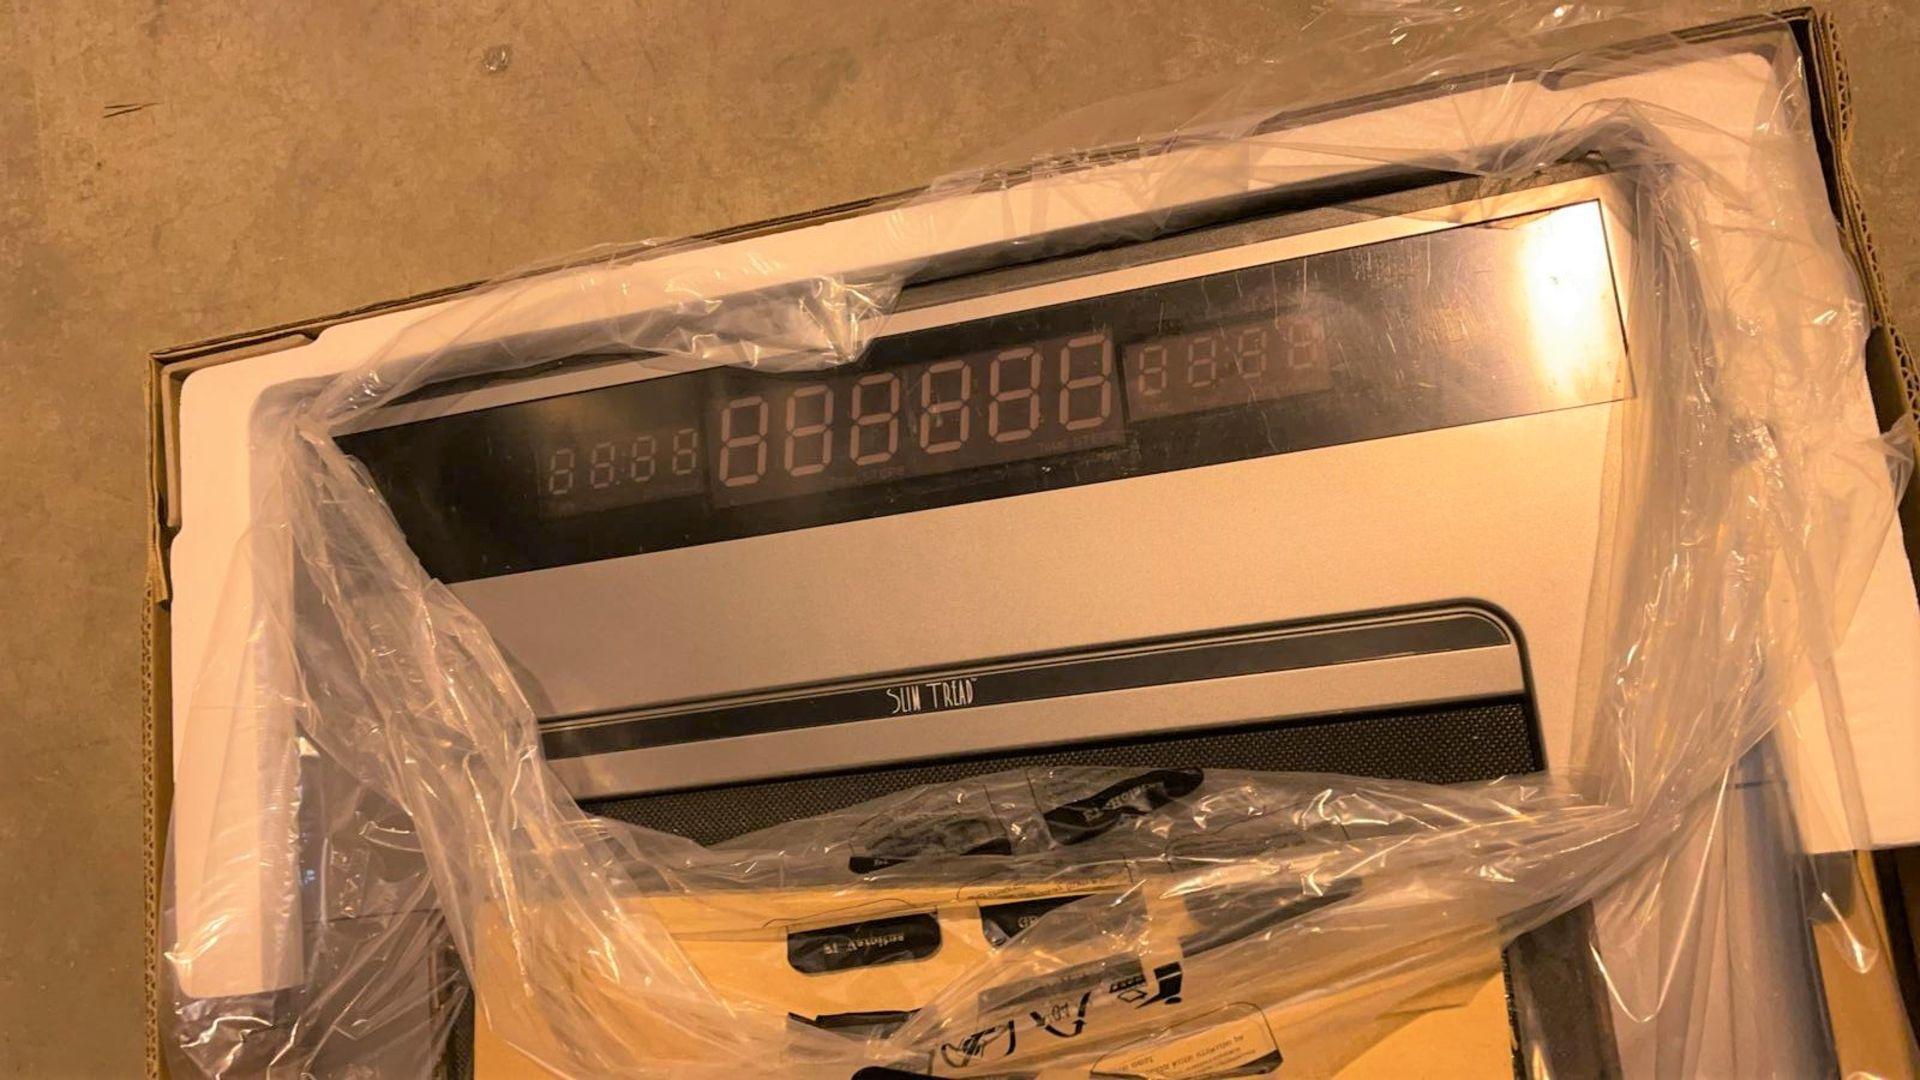 1 x Slim Tread Ultra Thin Smart Treadmill Running / Walking Machine - Lightweight With Folding - Image 8 of 23